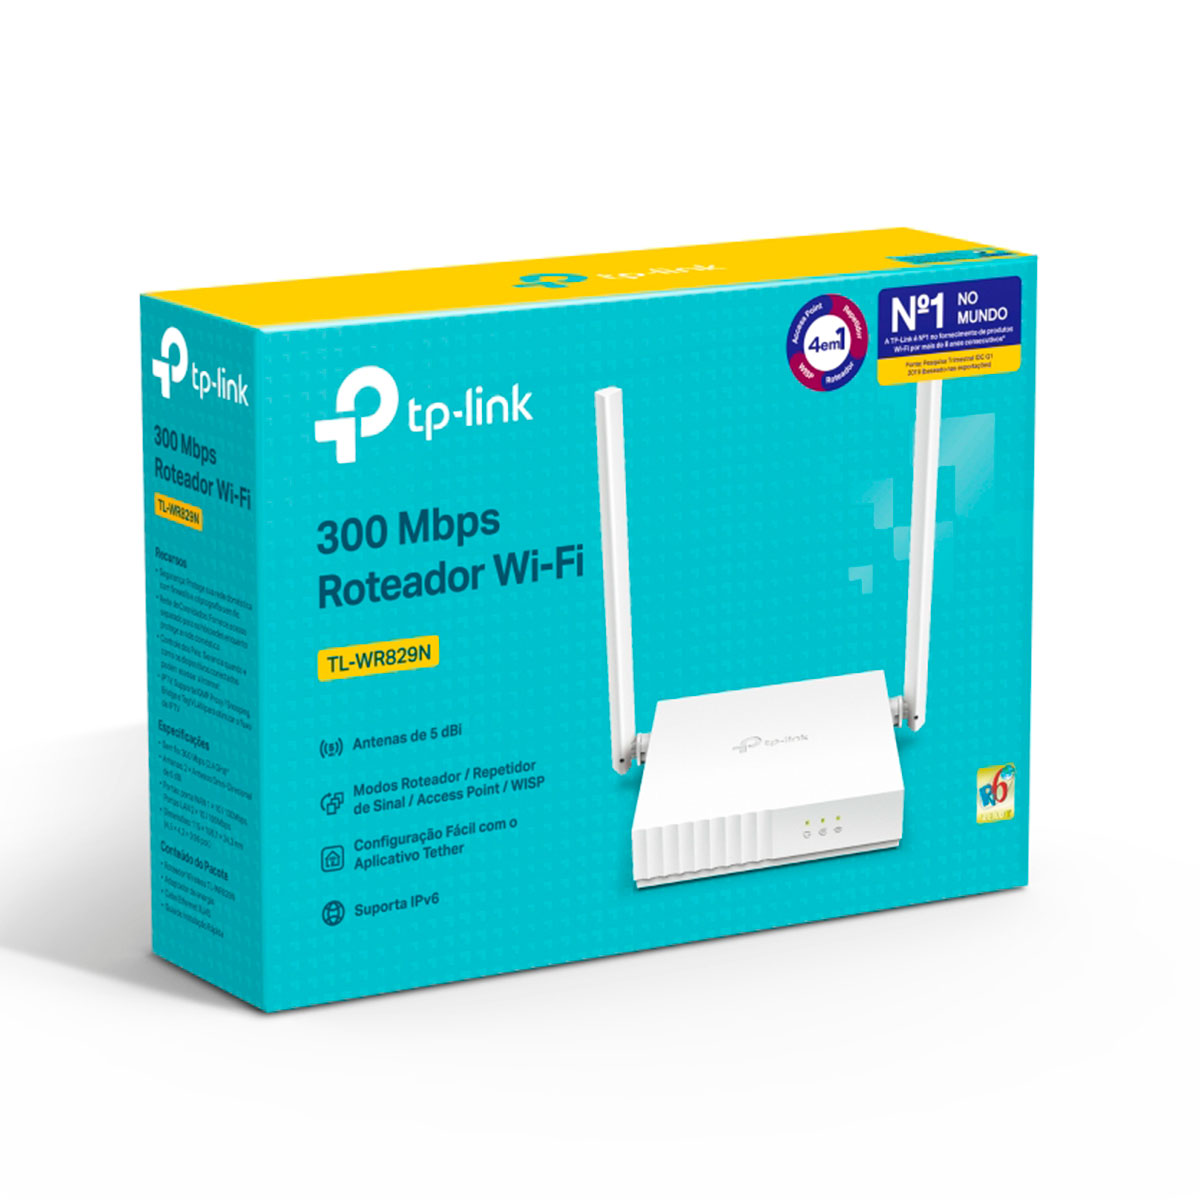 Roteador Wireless TP-Link TL-WR829N, Multimodo, 300 Mbps, 2 Antenas, 5dBi, IPv6